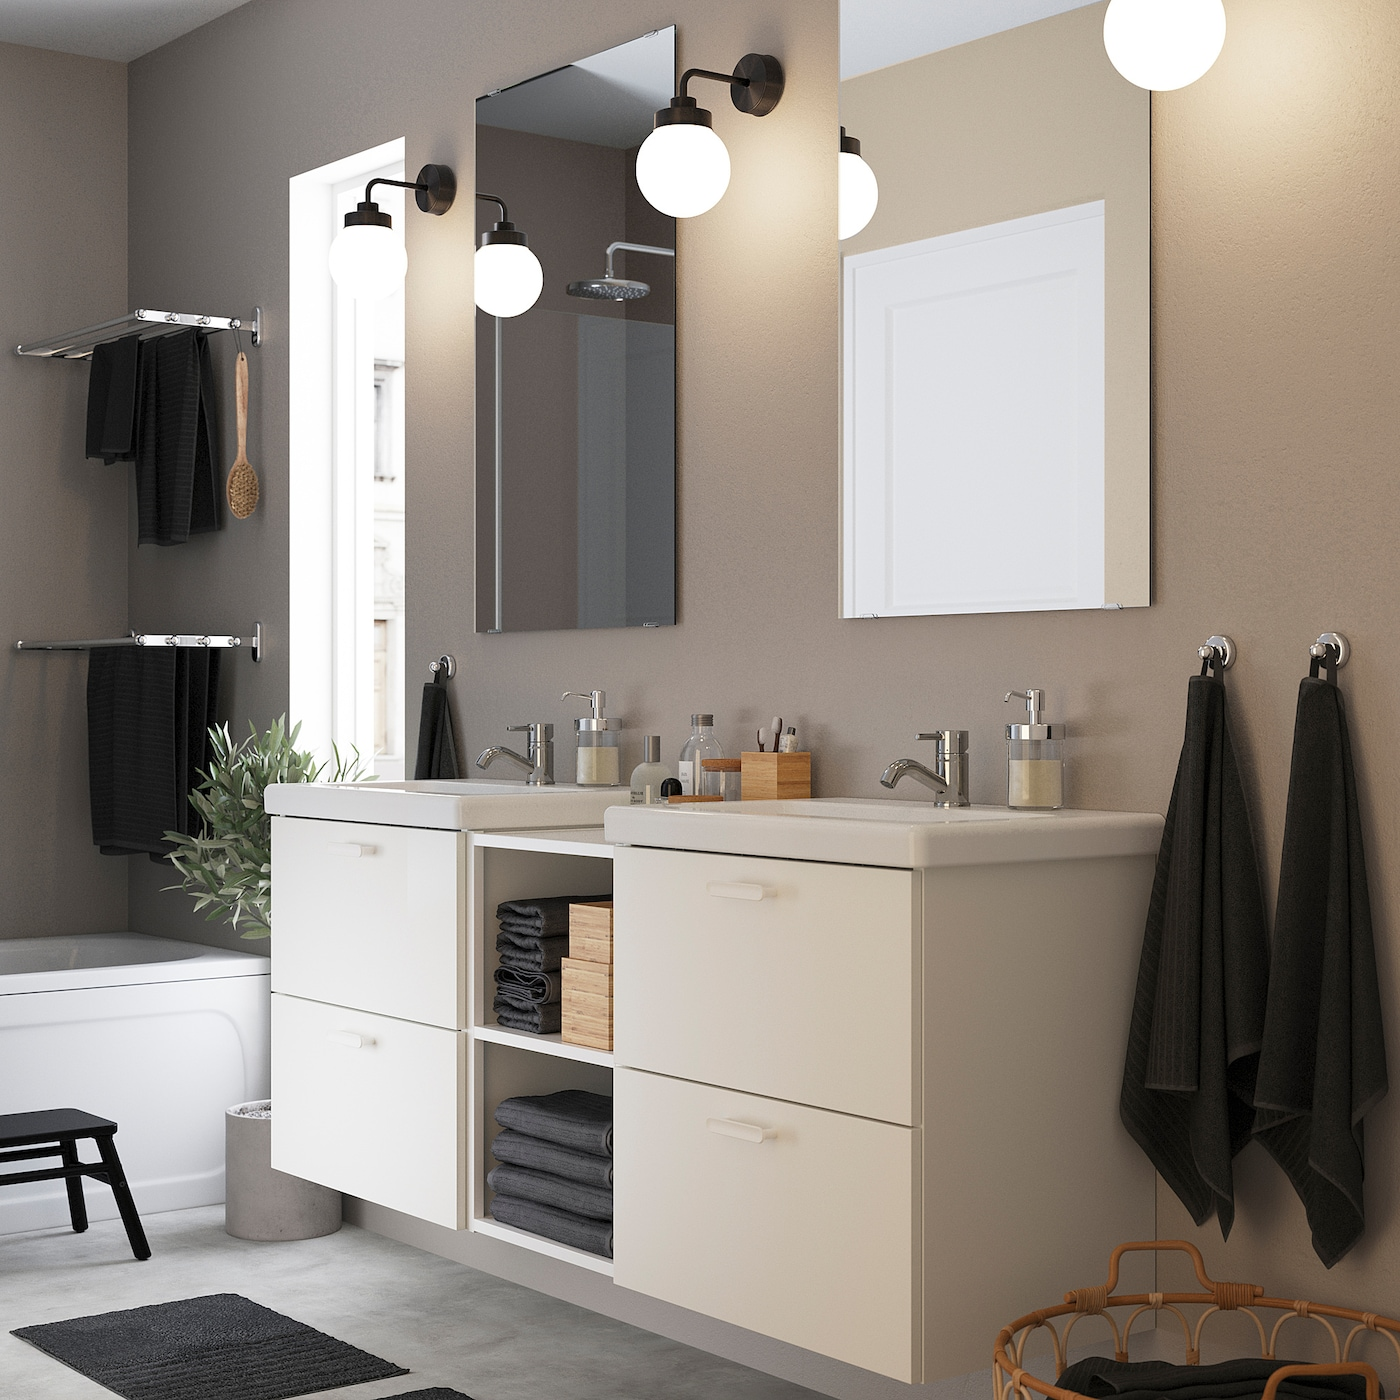 ENHET / TVÄLLEN Badezimmer Set 20 tlg.   weiß/PILKÅN Mischbatterie  20x20x20 cm